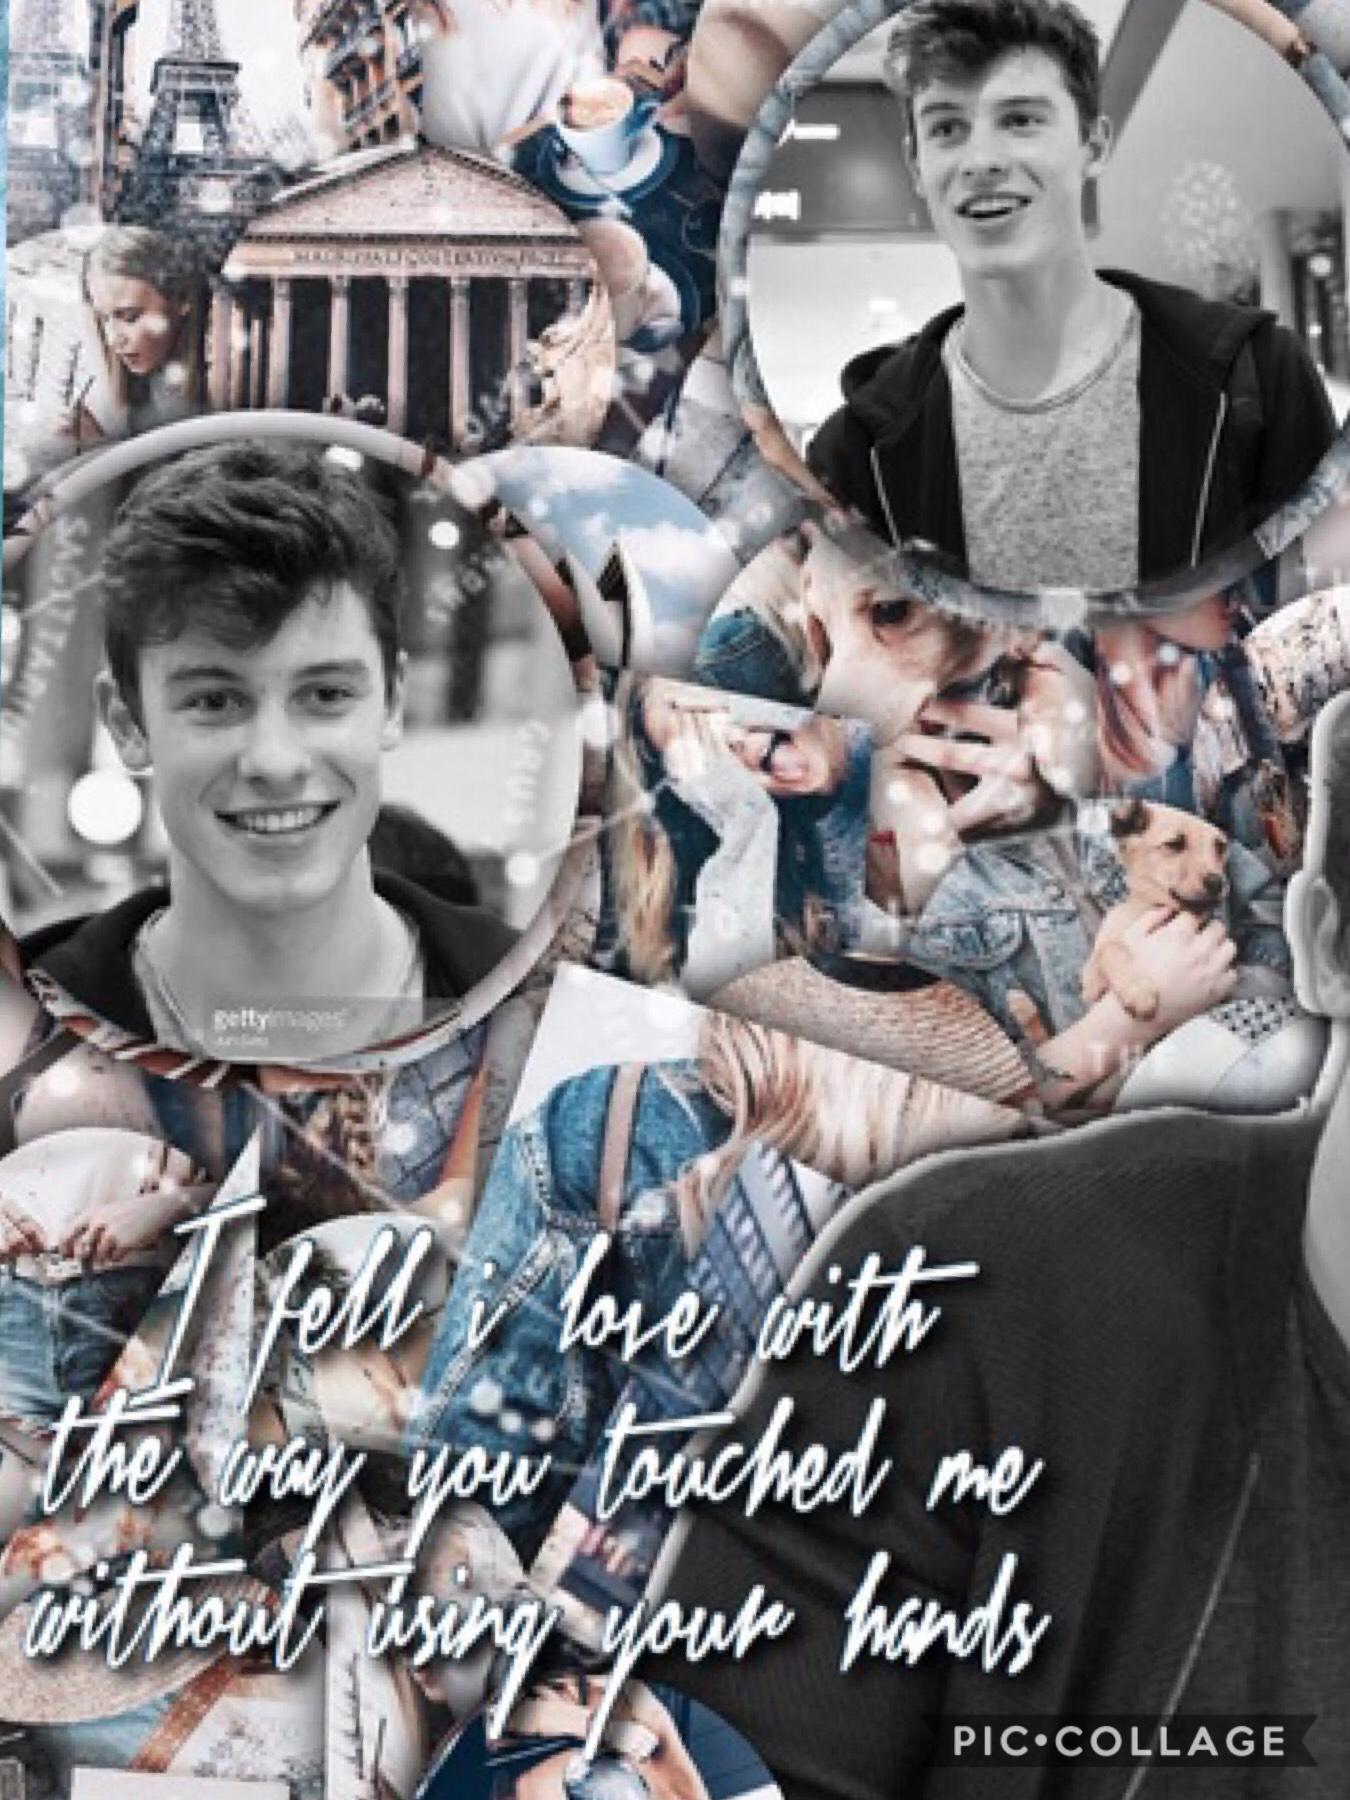 Collage by waterbillie